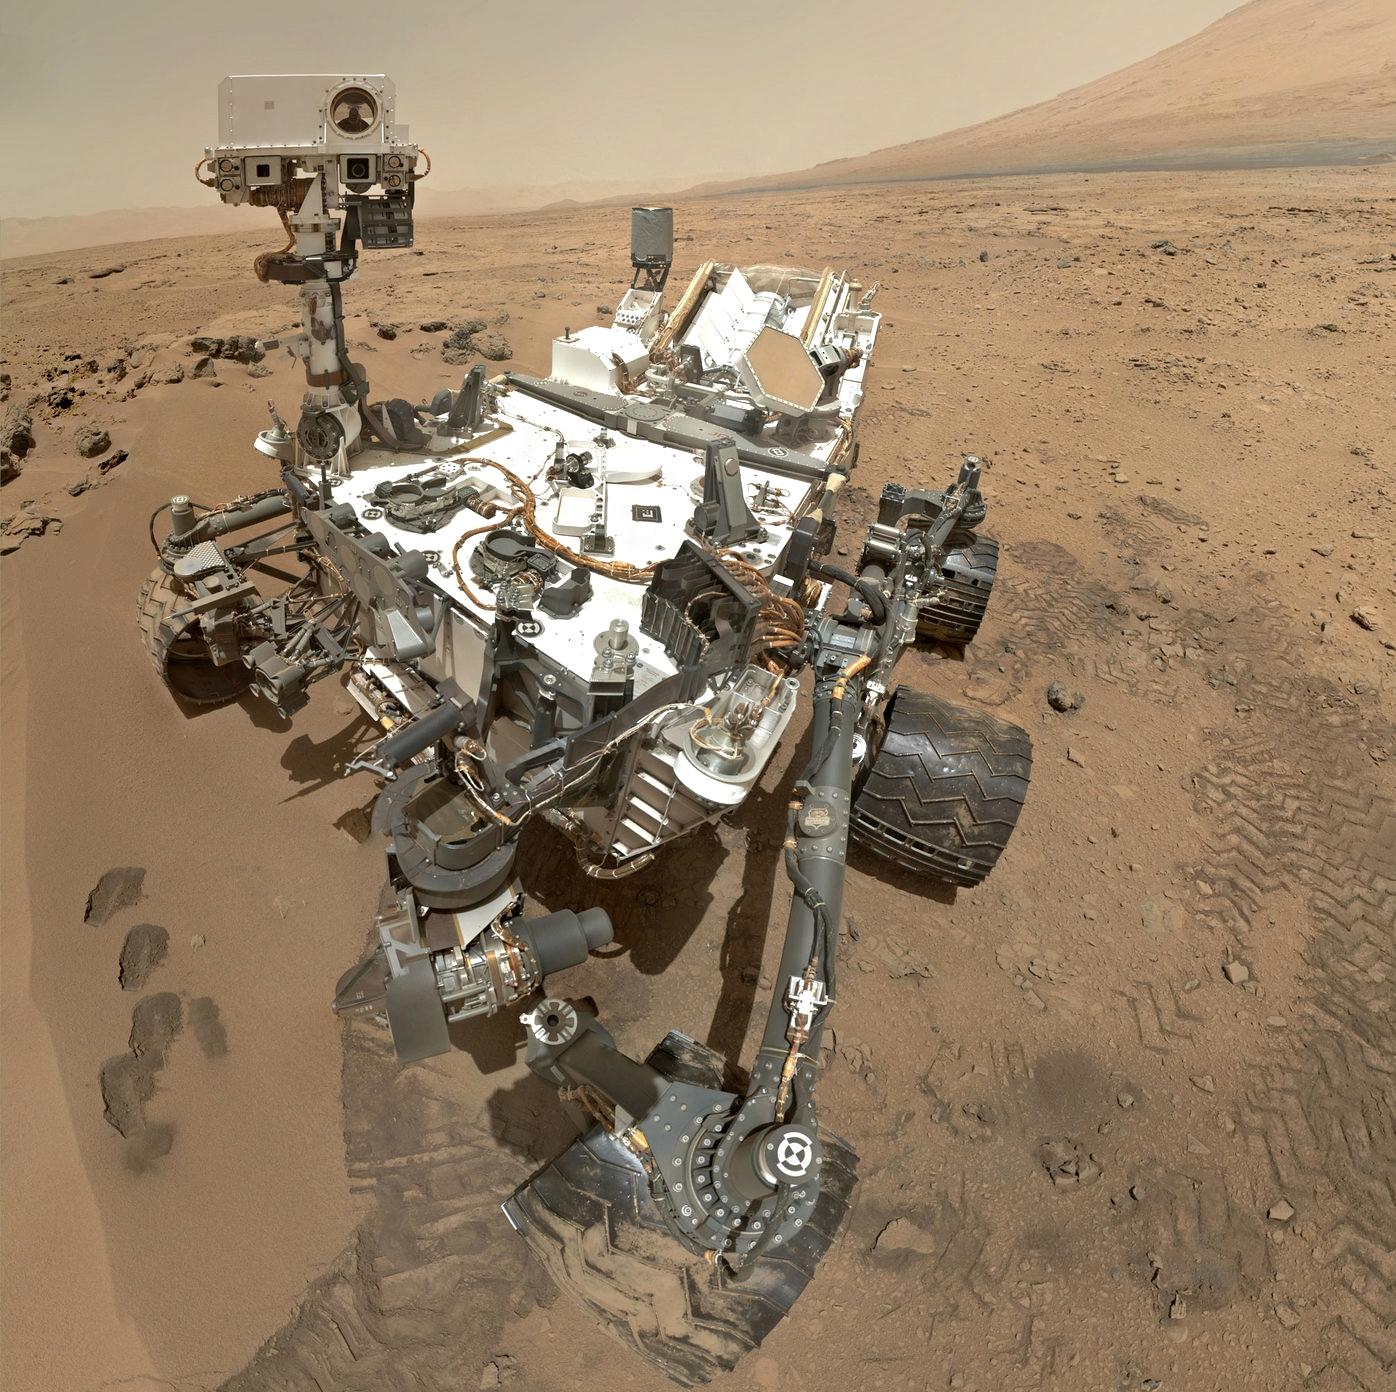 mars curiosity rover.jpg